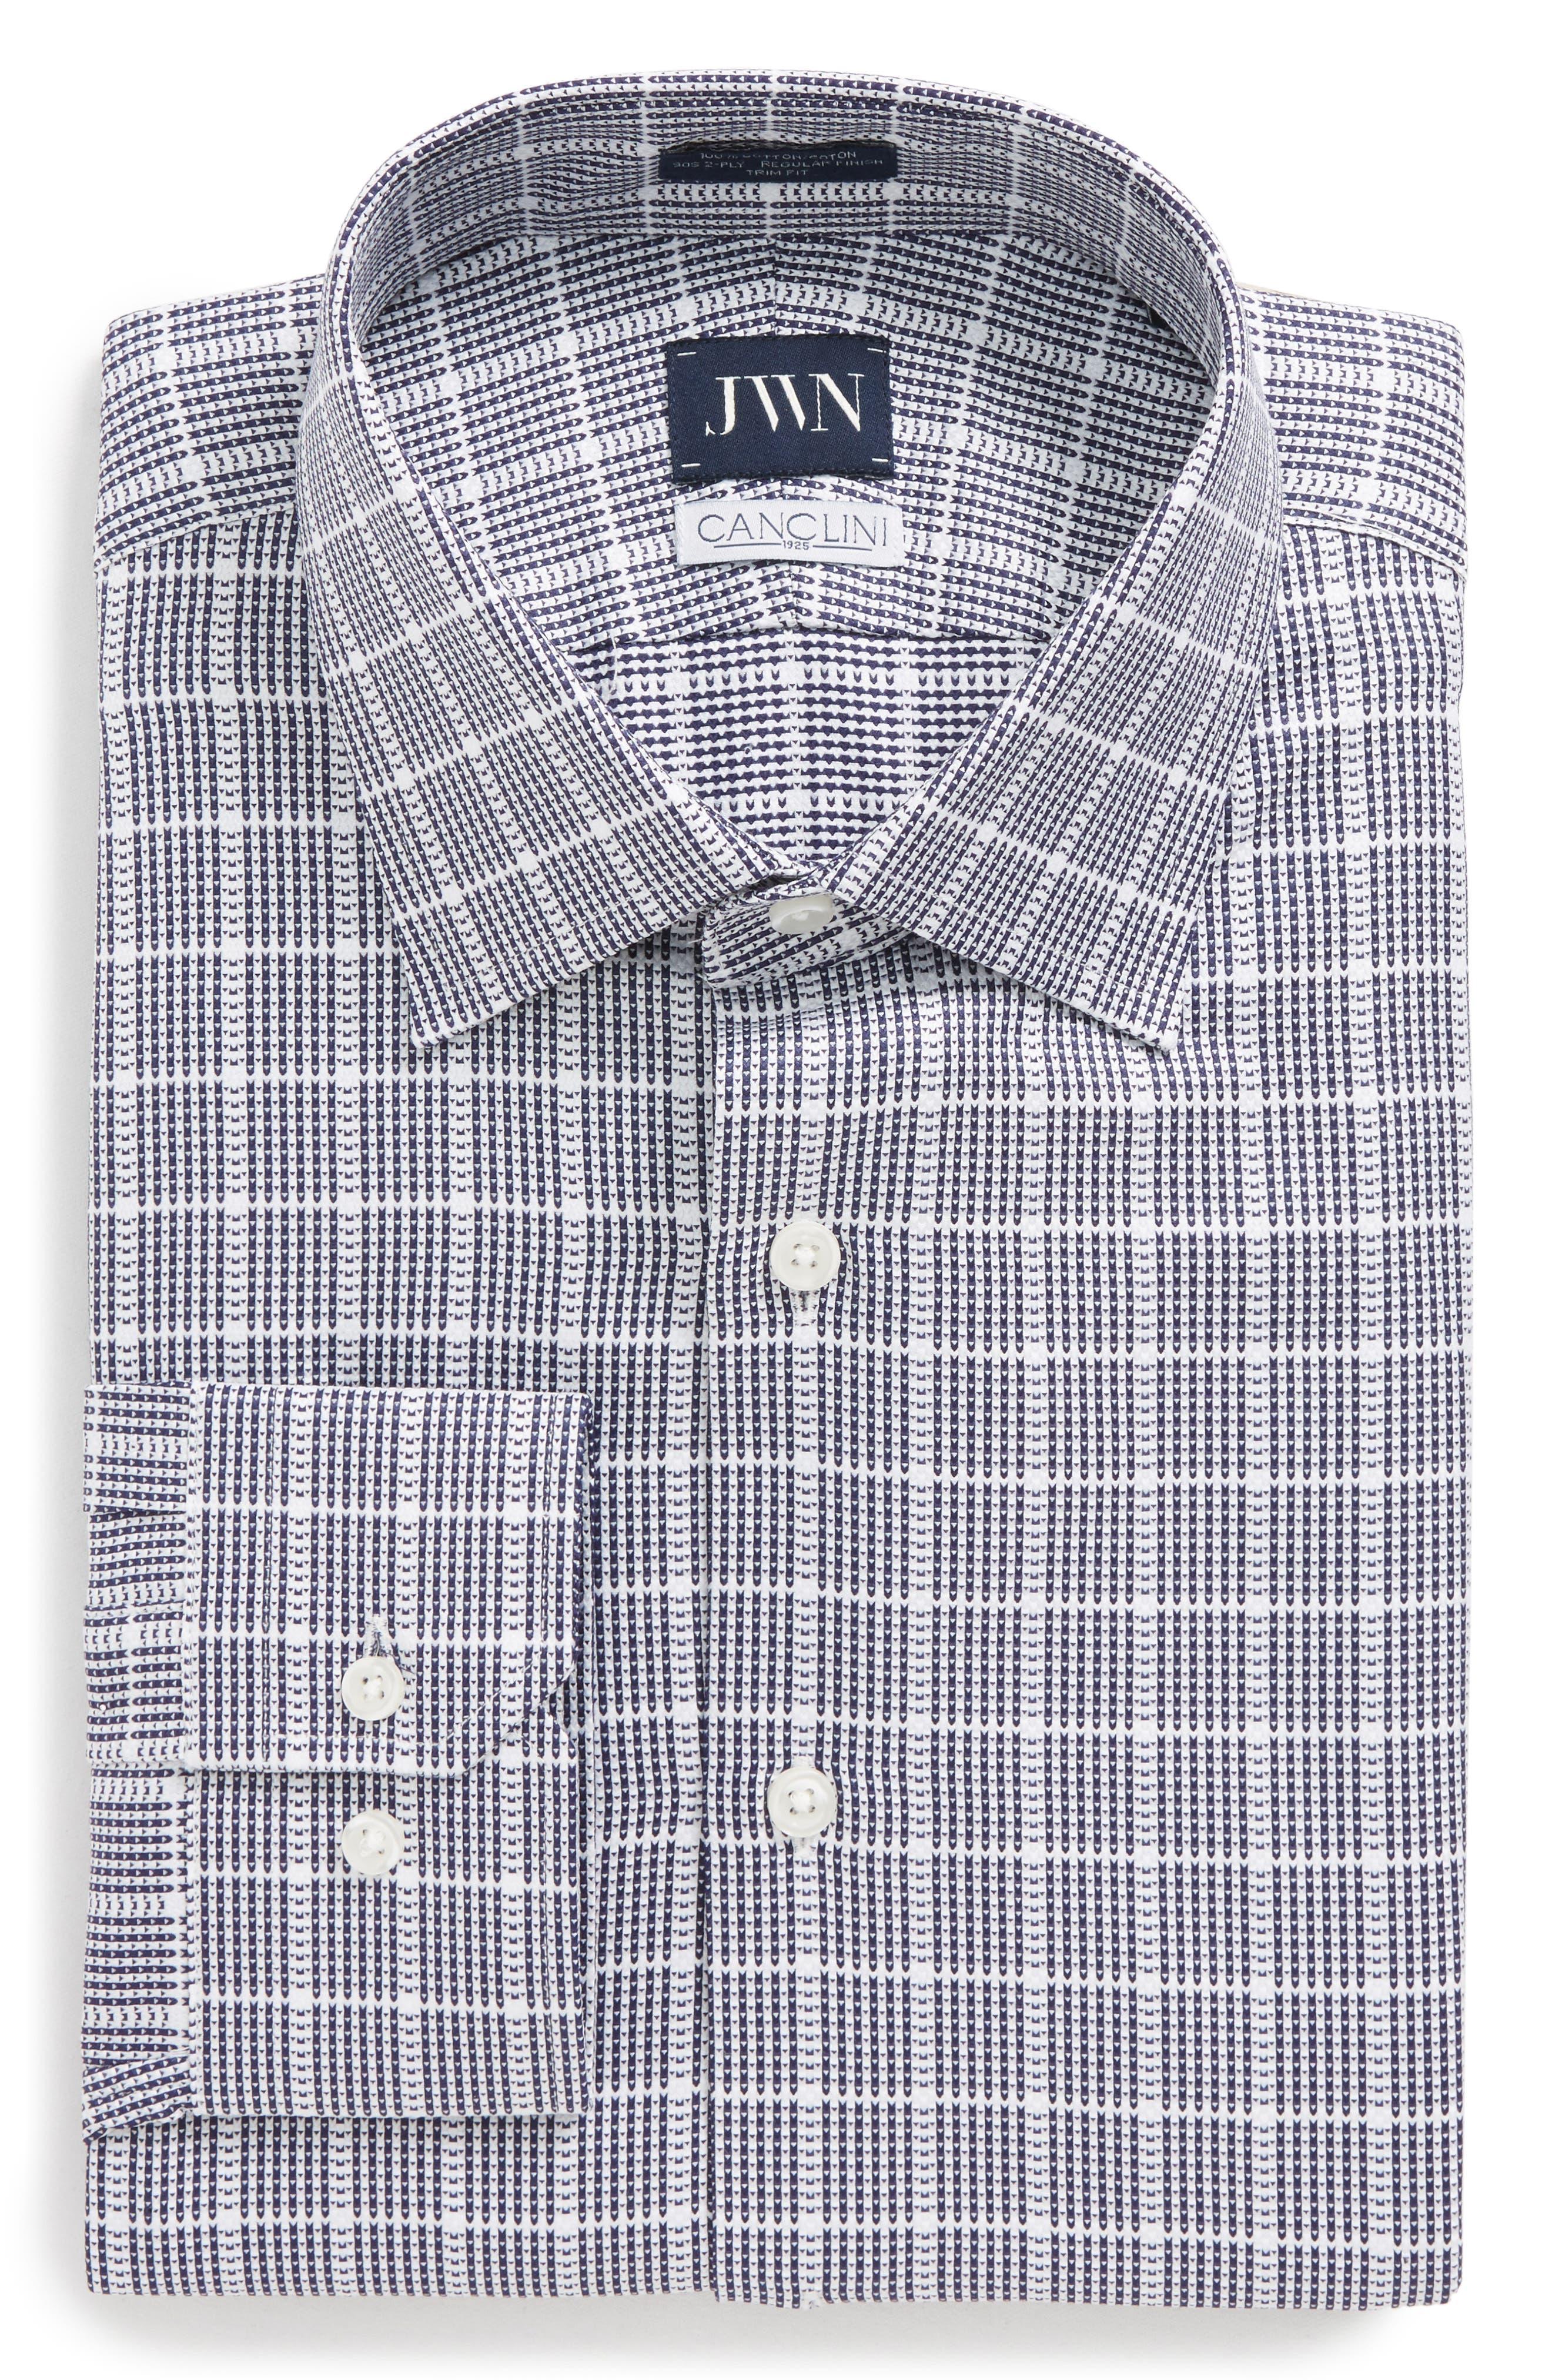 Trim Fit Check Dress Shirt,                             Main thumbnail 1, color,                             Navy Dusk